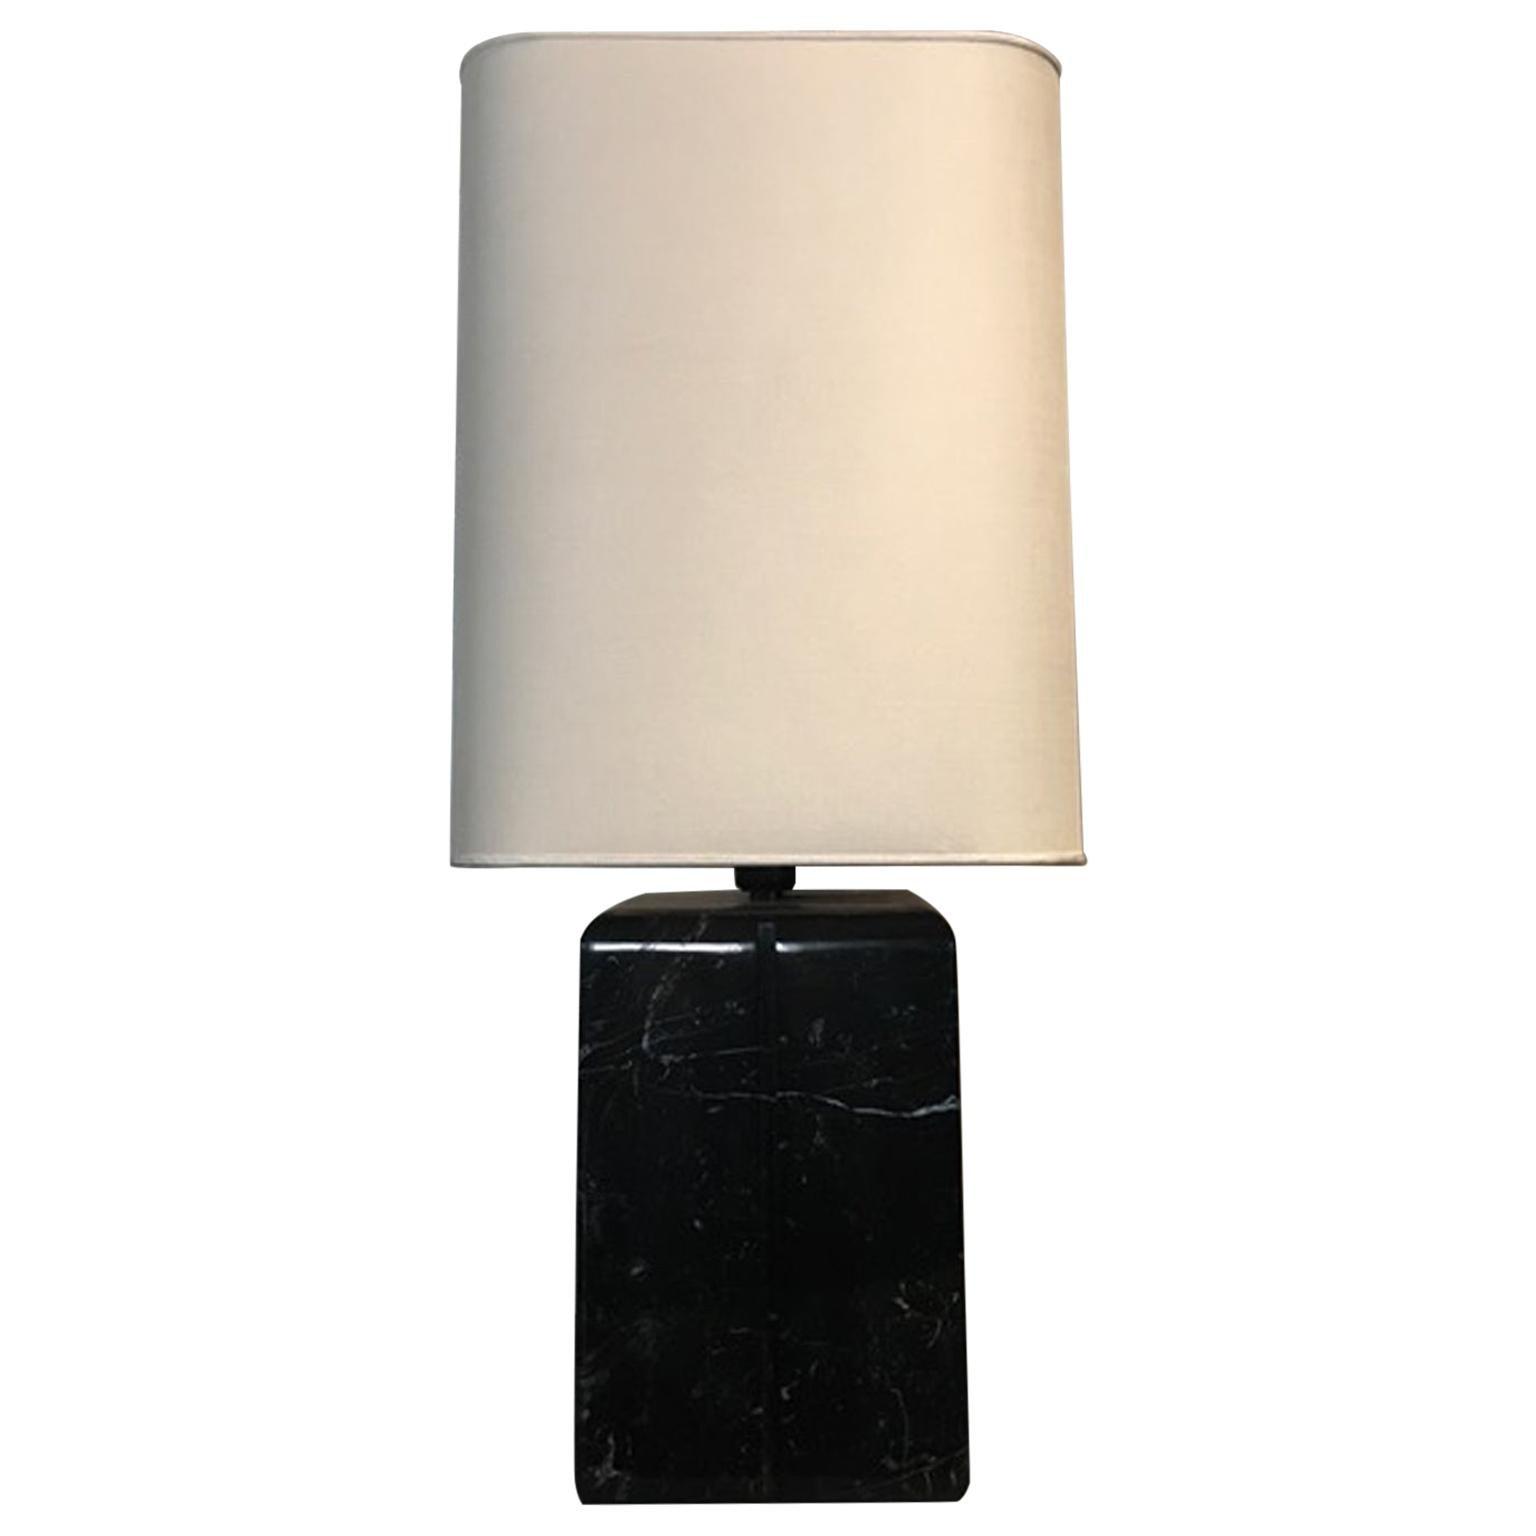 Italy Postmodern Design Style Black Marble Table Lamp